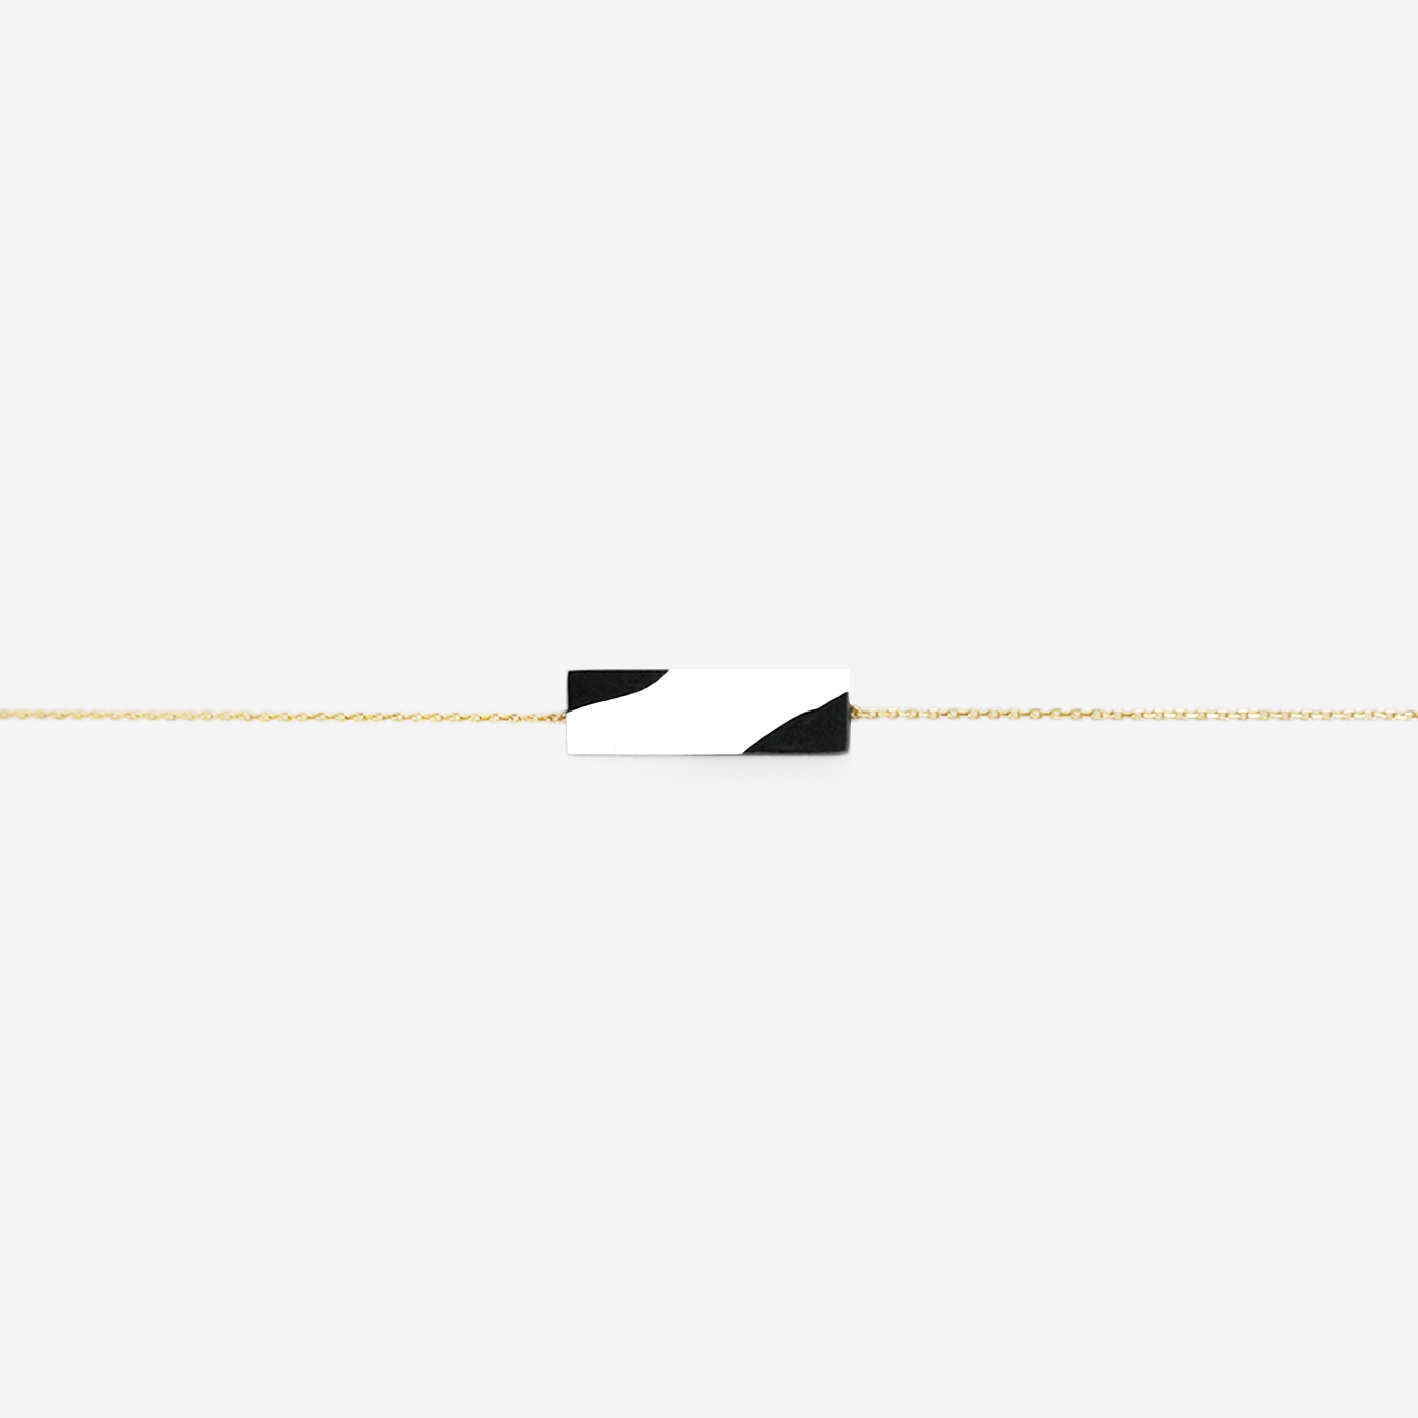 METOOWORKSHOP 芝麻弧系列黑白极简项链气质简约锁骨链